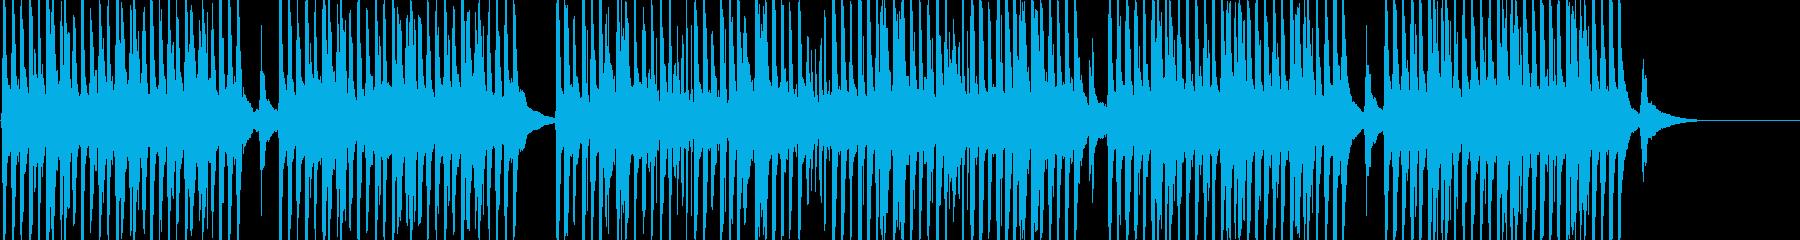 YouTubeに楽しげな口笛&トイピアノの再生済みの波形